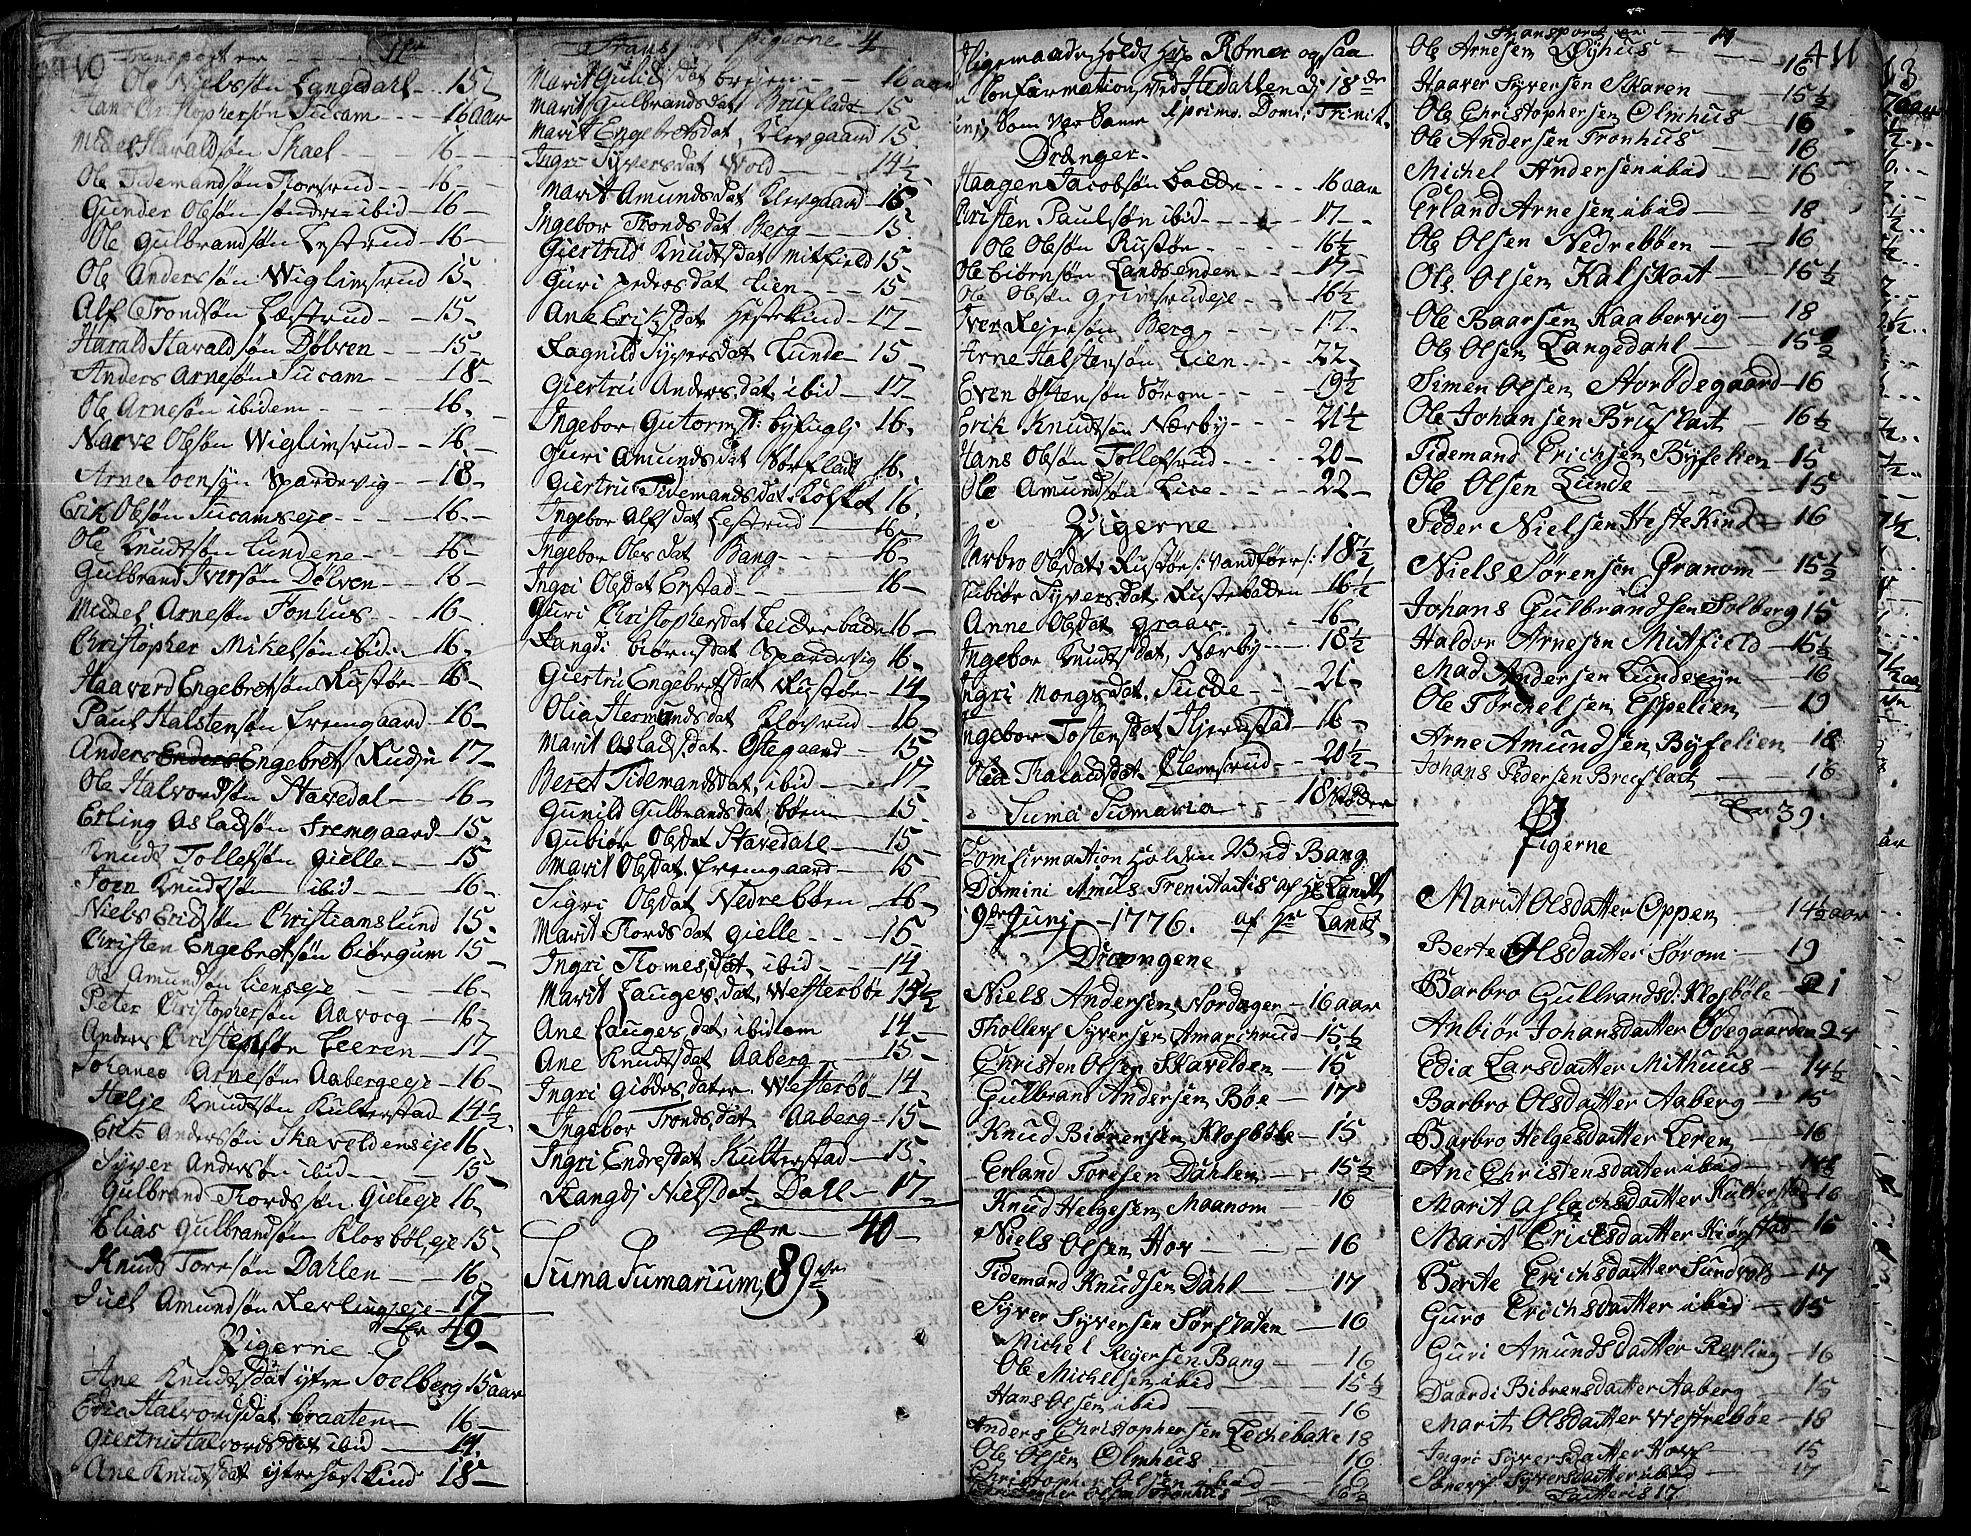 SAH, Aurdal prestekontor, Ministerialbok nr. 5, 1763-1781, s. 410-411